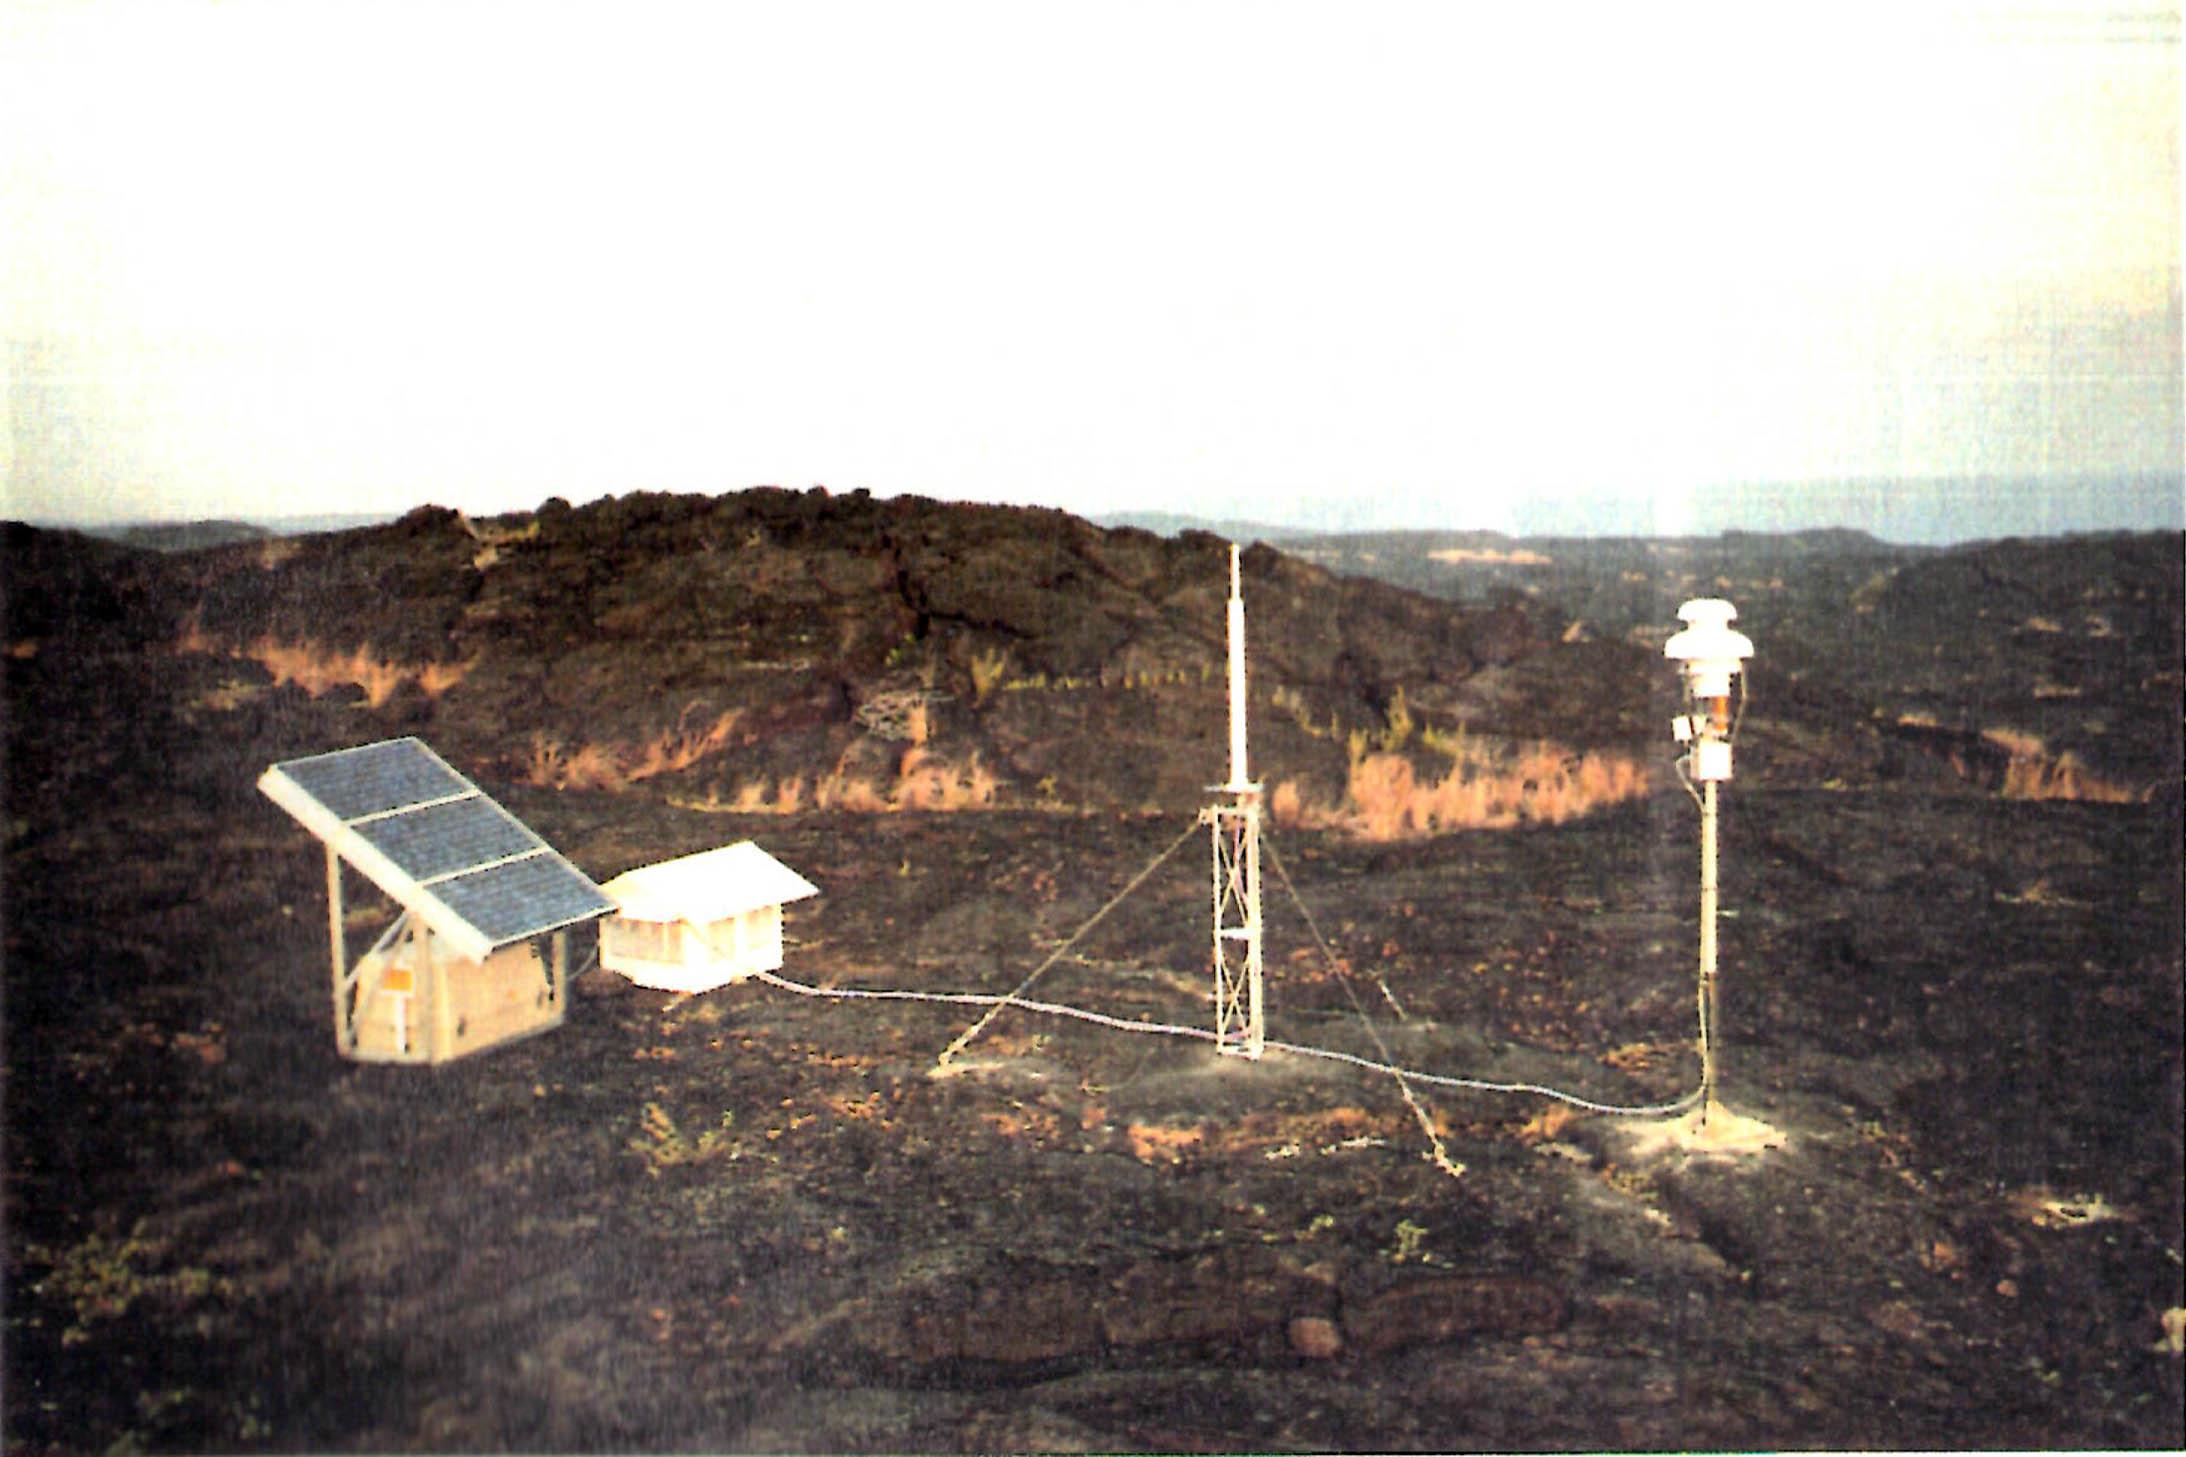 DORIS station: KAENA POINT - U.S.A.